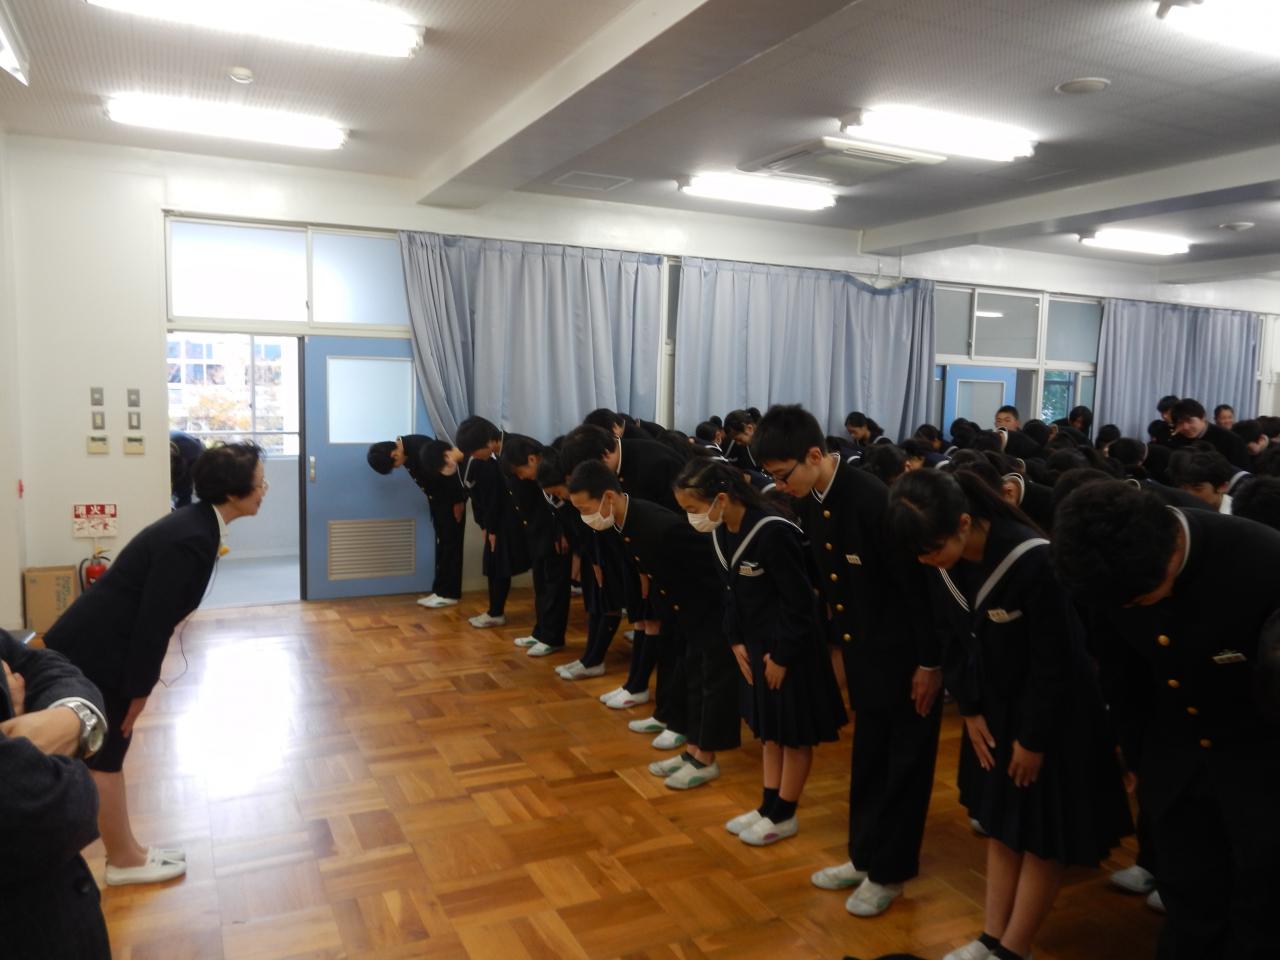 11月6日箕面市立第一中学校で川端和子講師が職場体験マナー研修を実施!